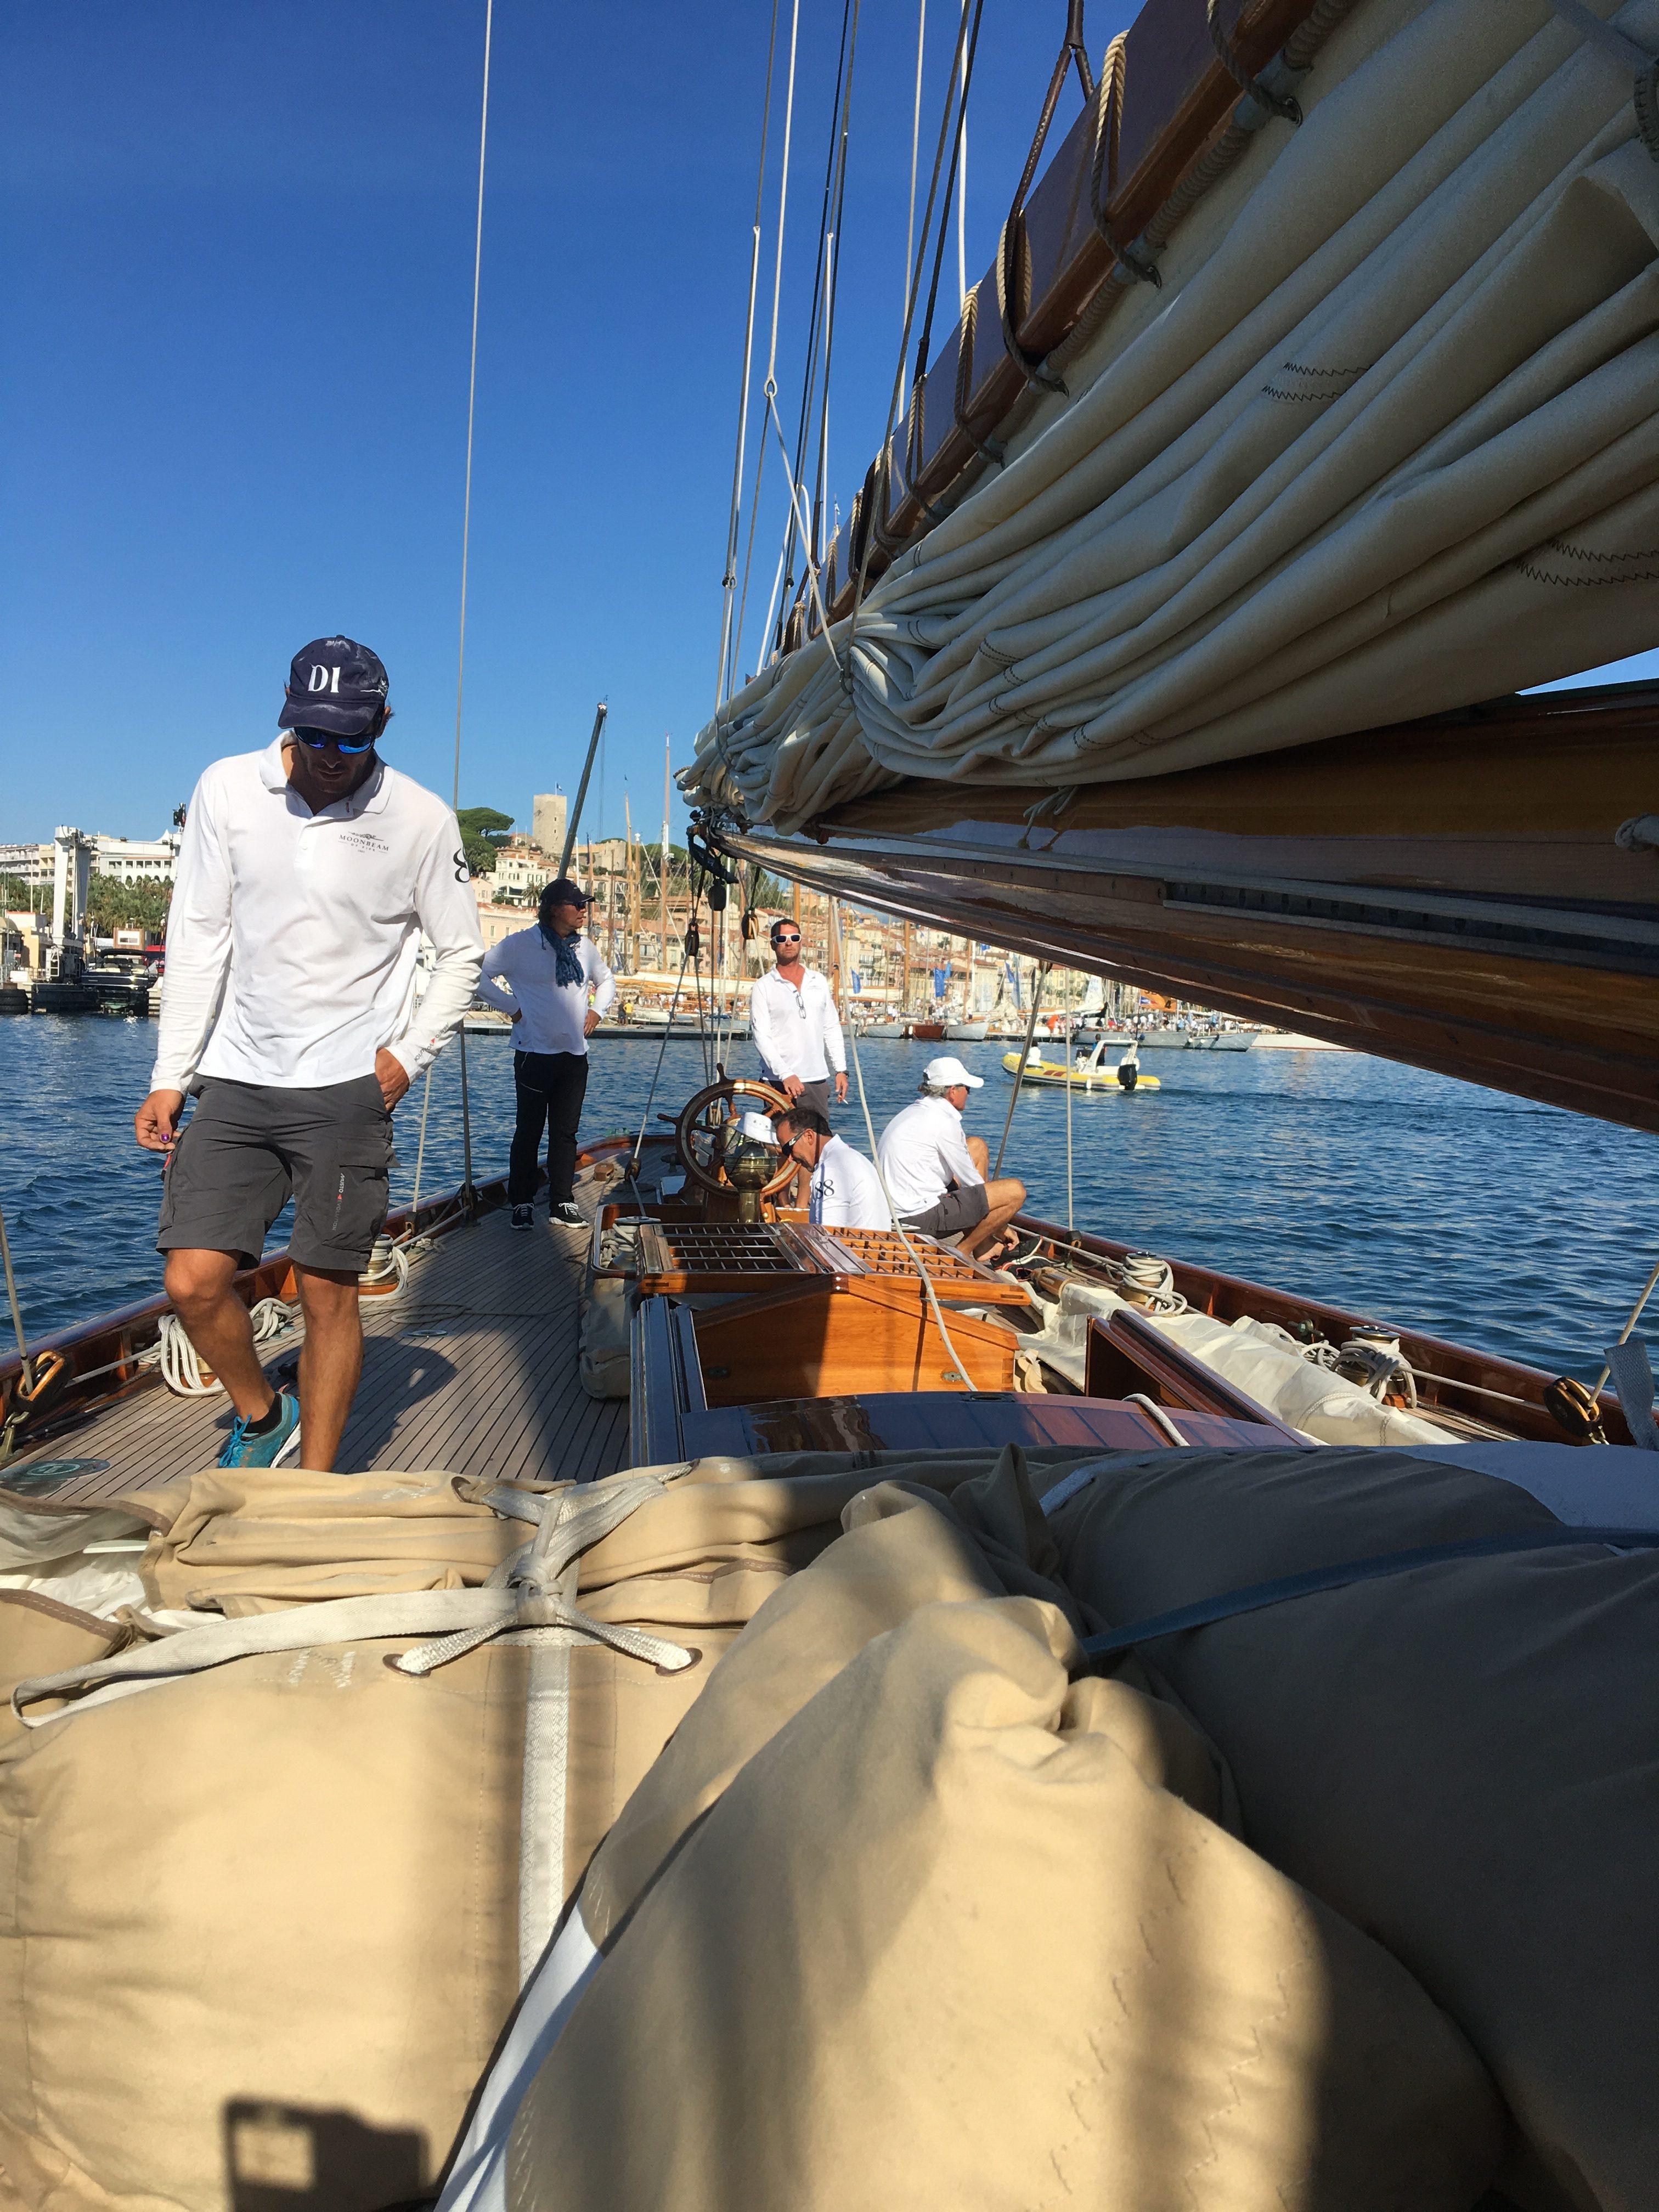 Aboard Moonbeam of Fife sailing yacht